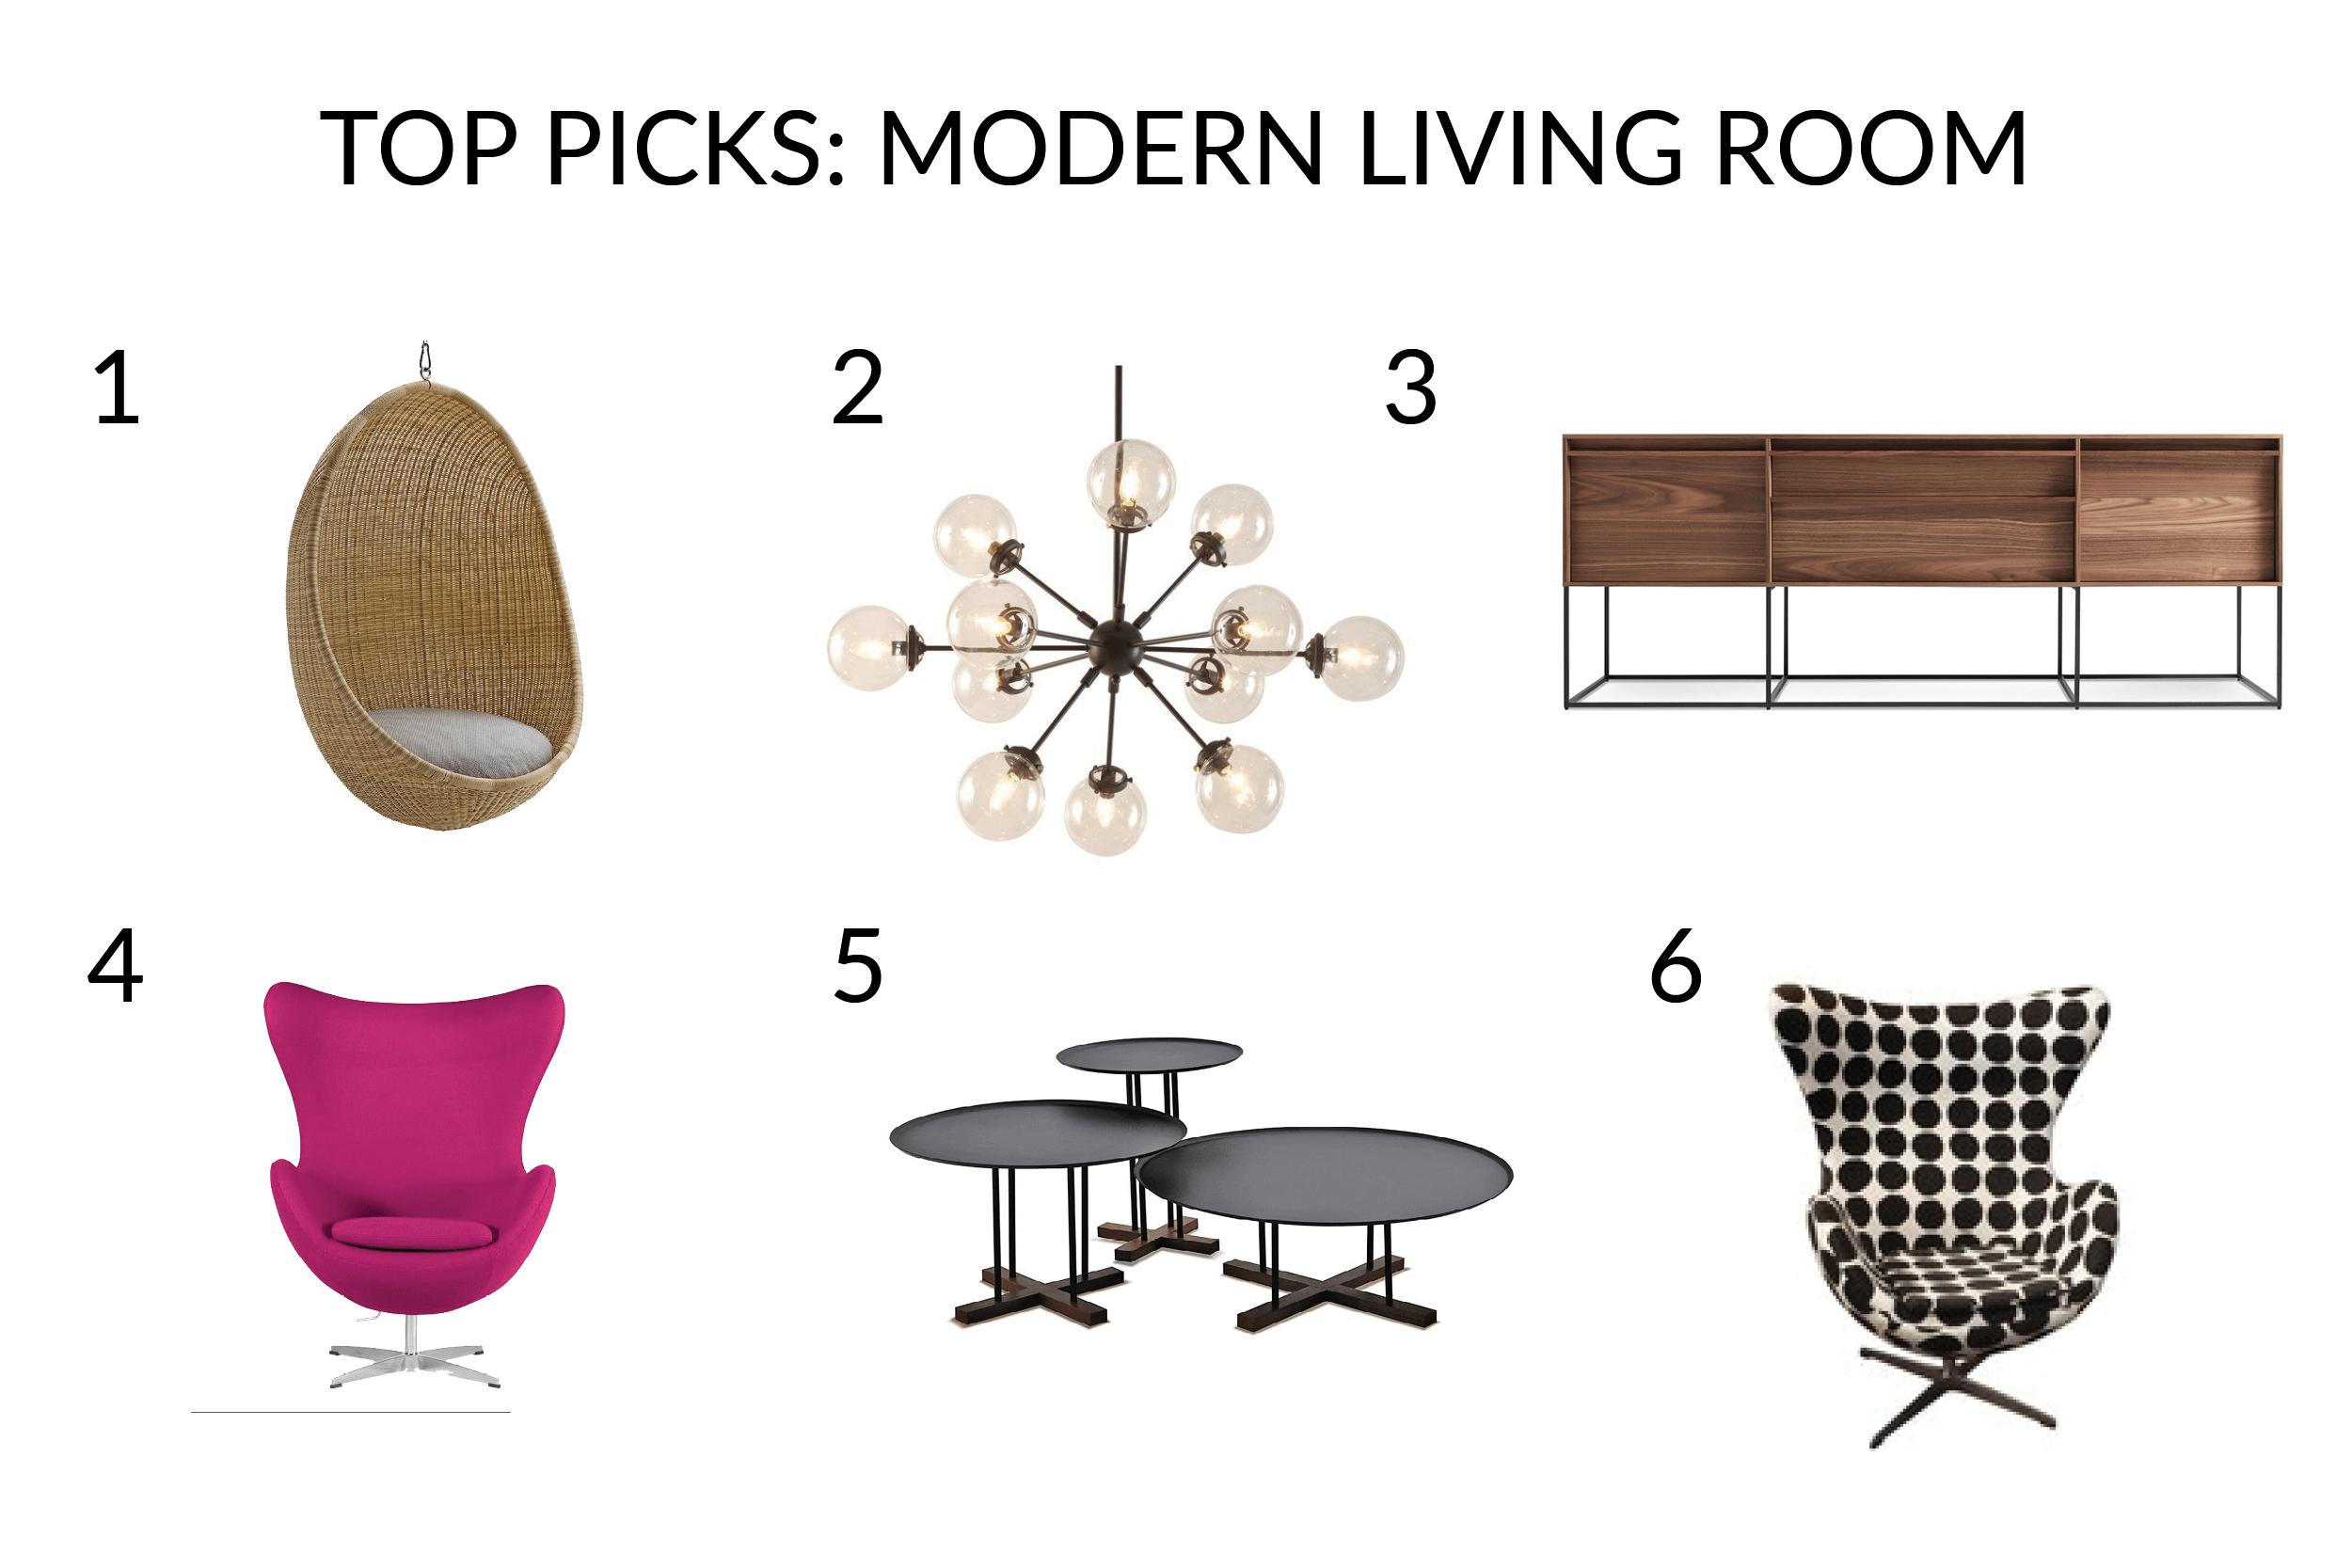 furniture for colorful modern living room interior design